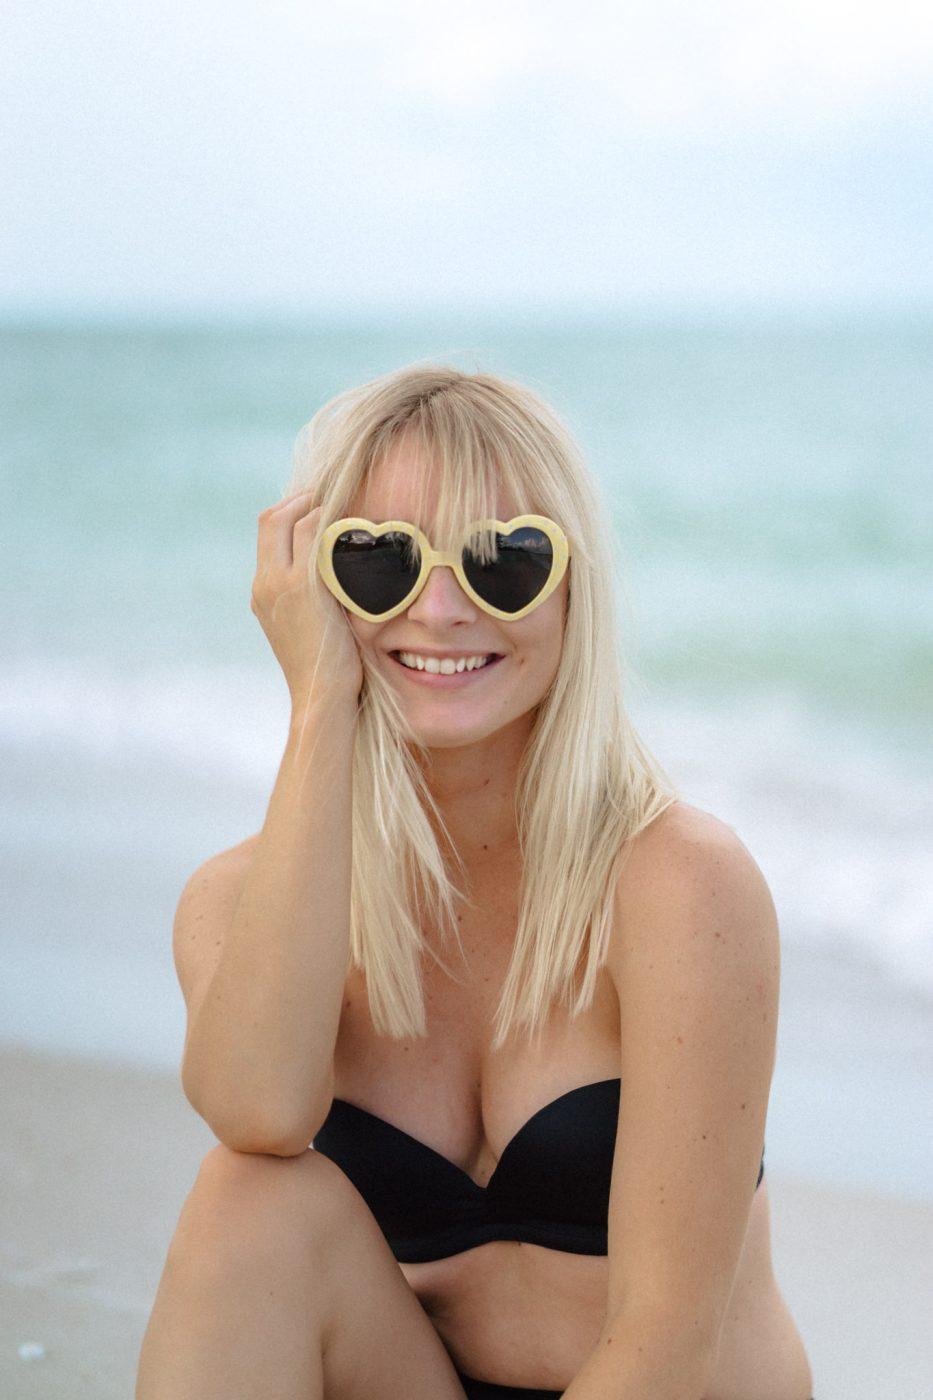 Jenny wearing heart sunglasses